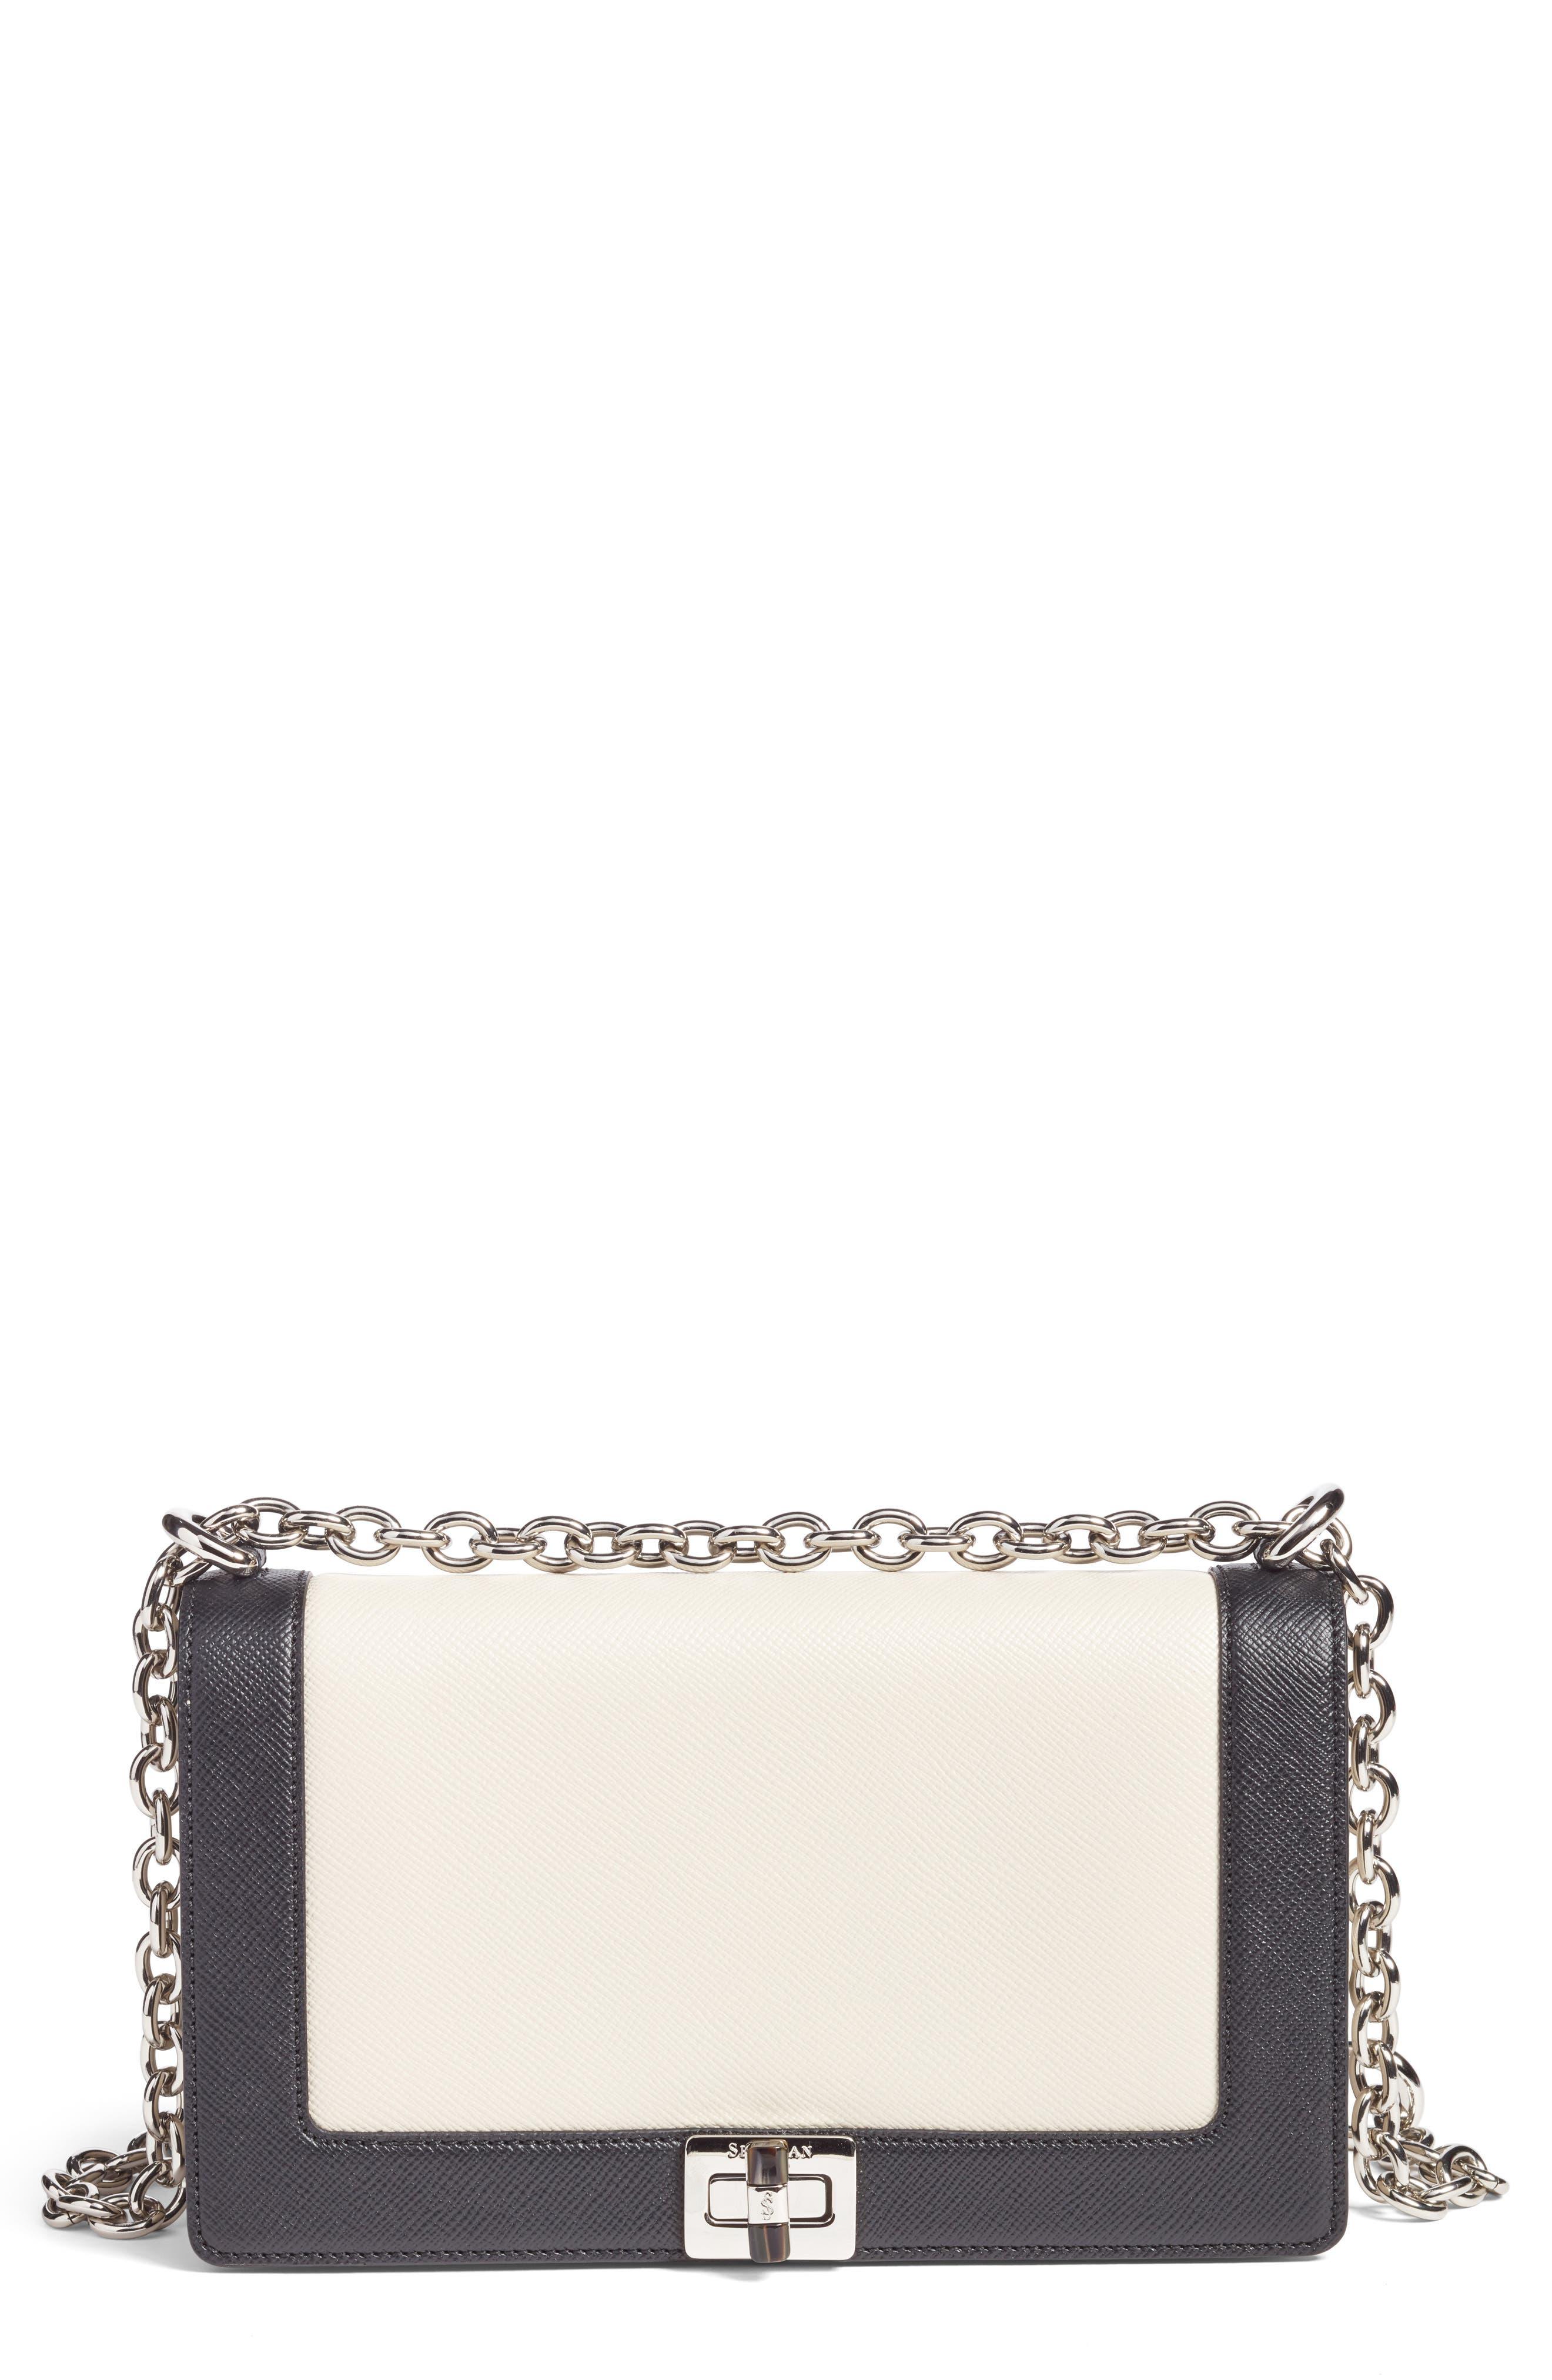 Serapian Milano Roberta Evolution Leather Crossbody Bag